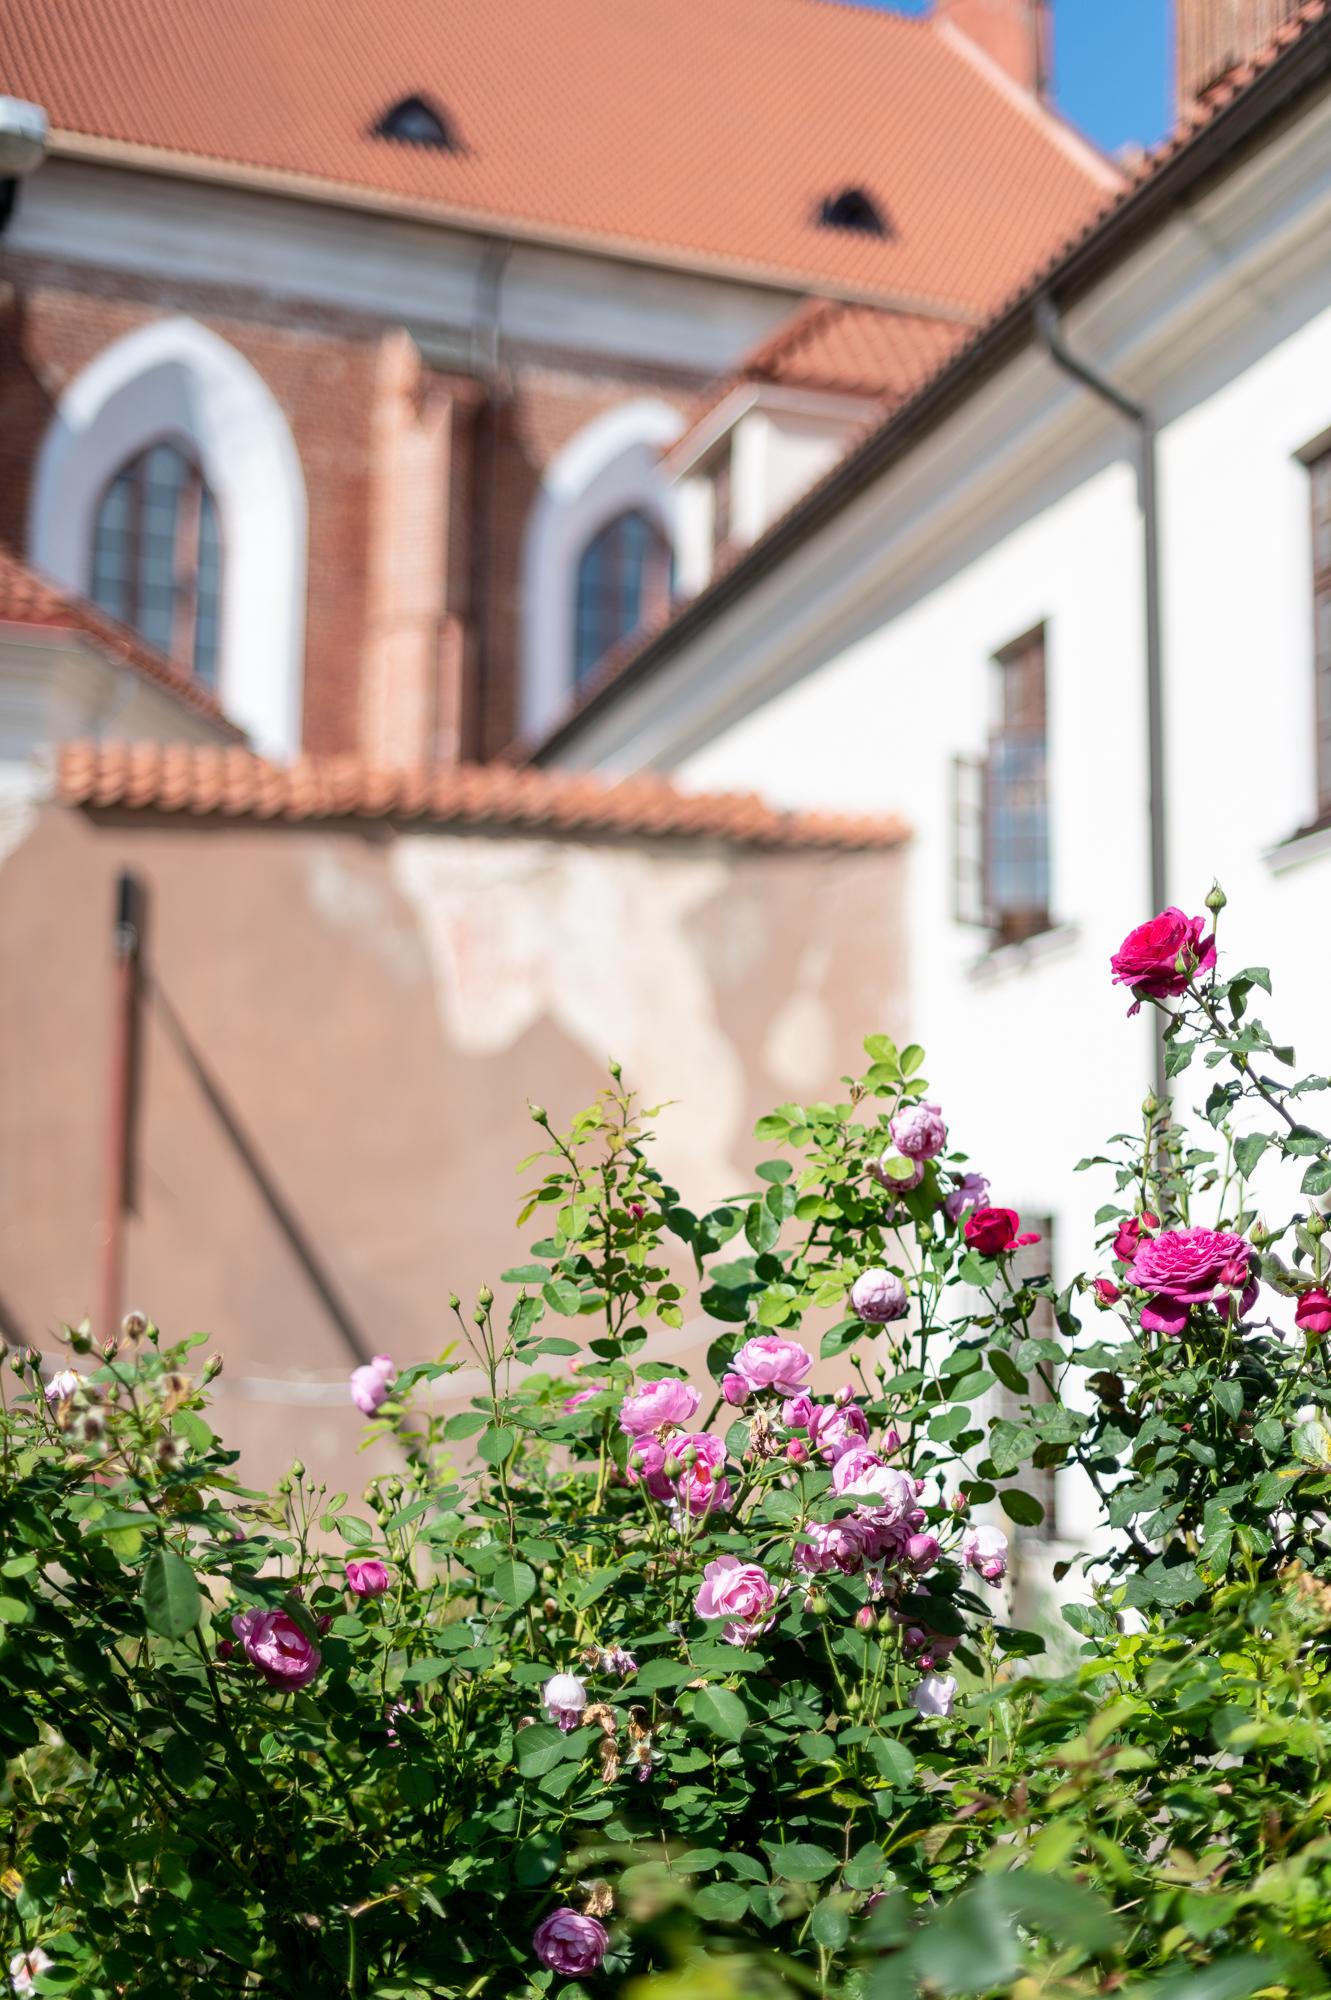 Bernardinų rožės ir architektūra.